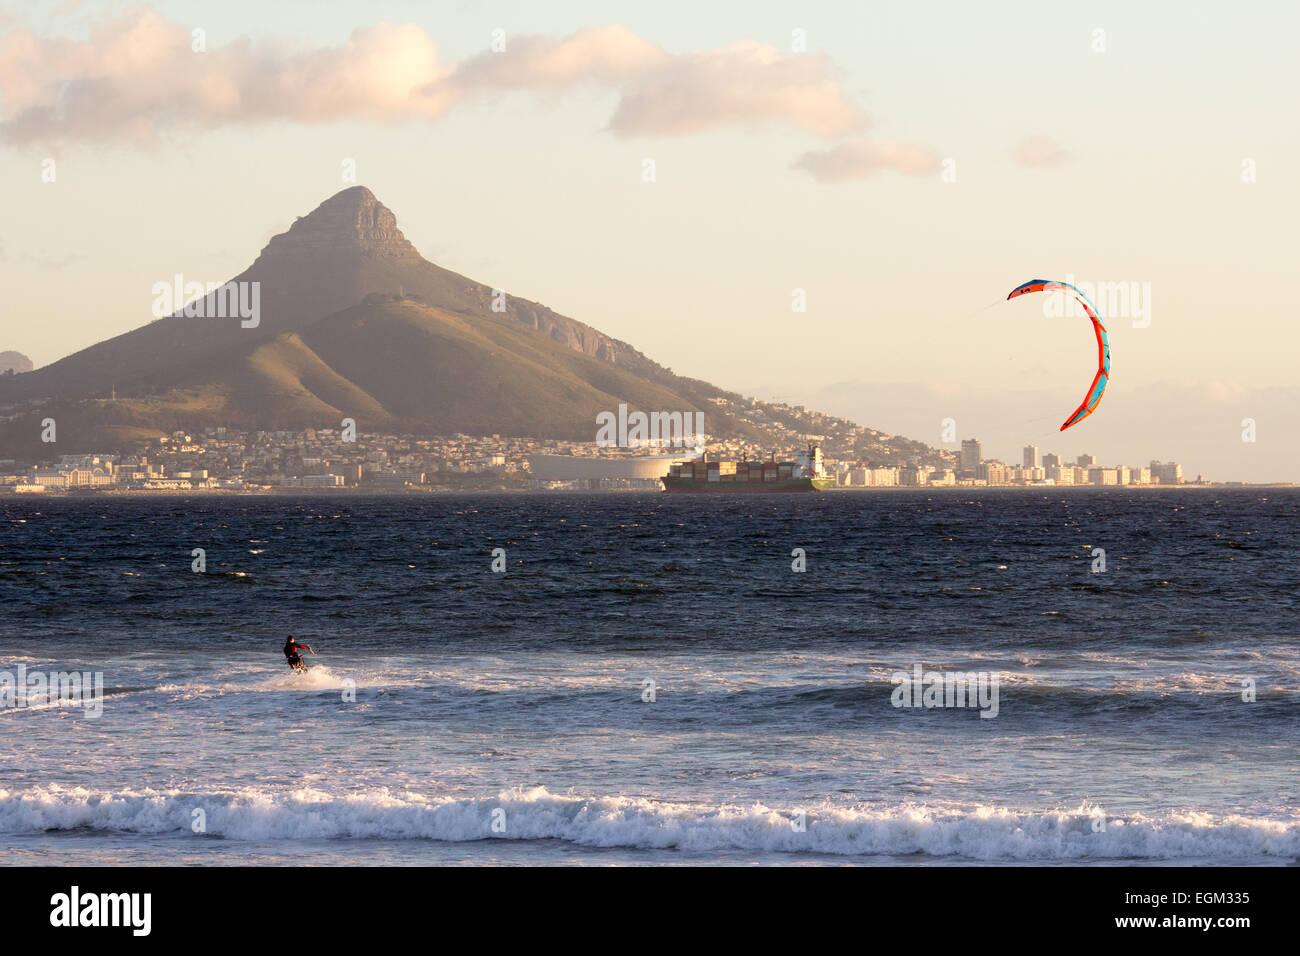 Windsurf a Cape Town Immagini Stock